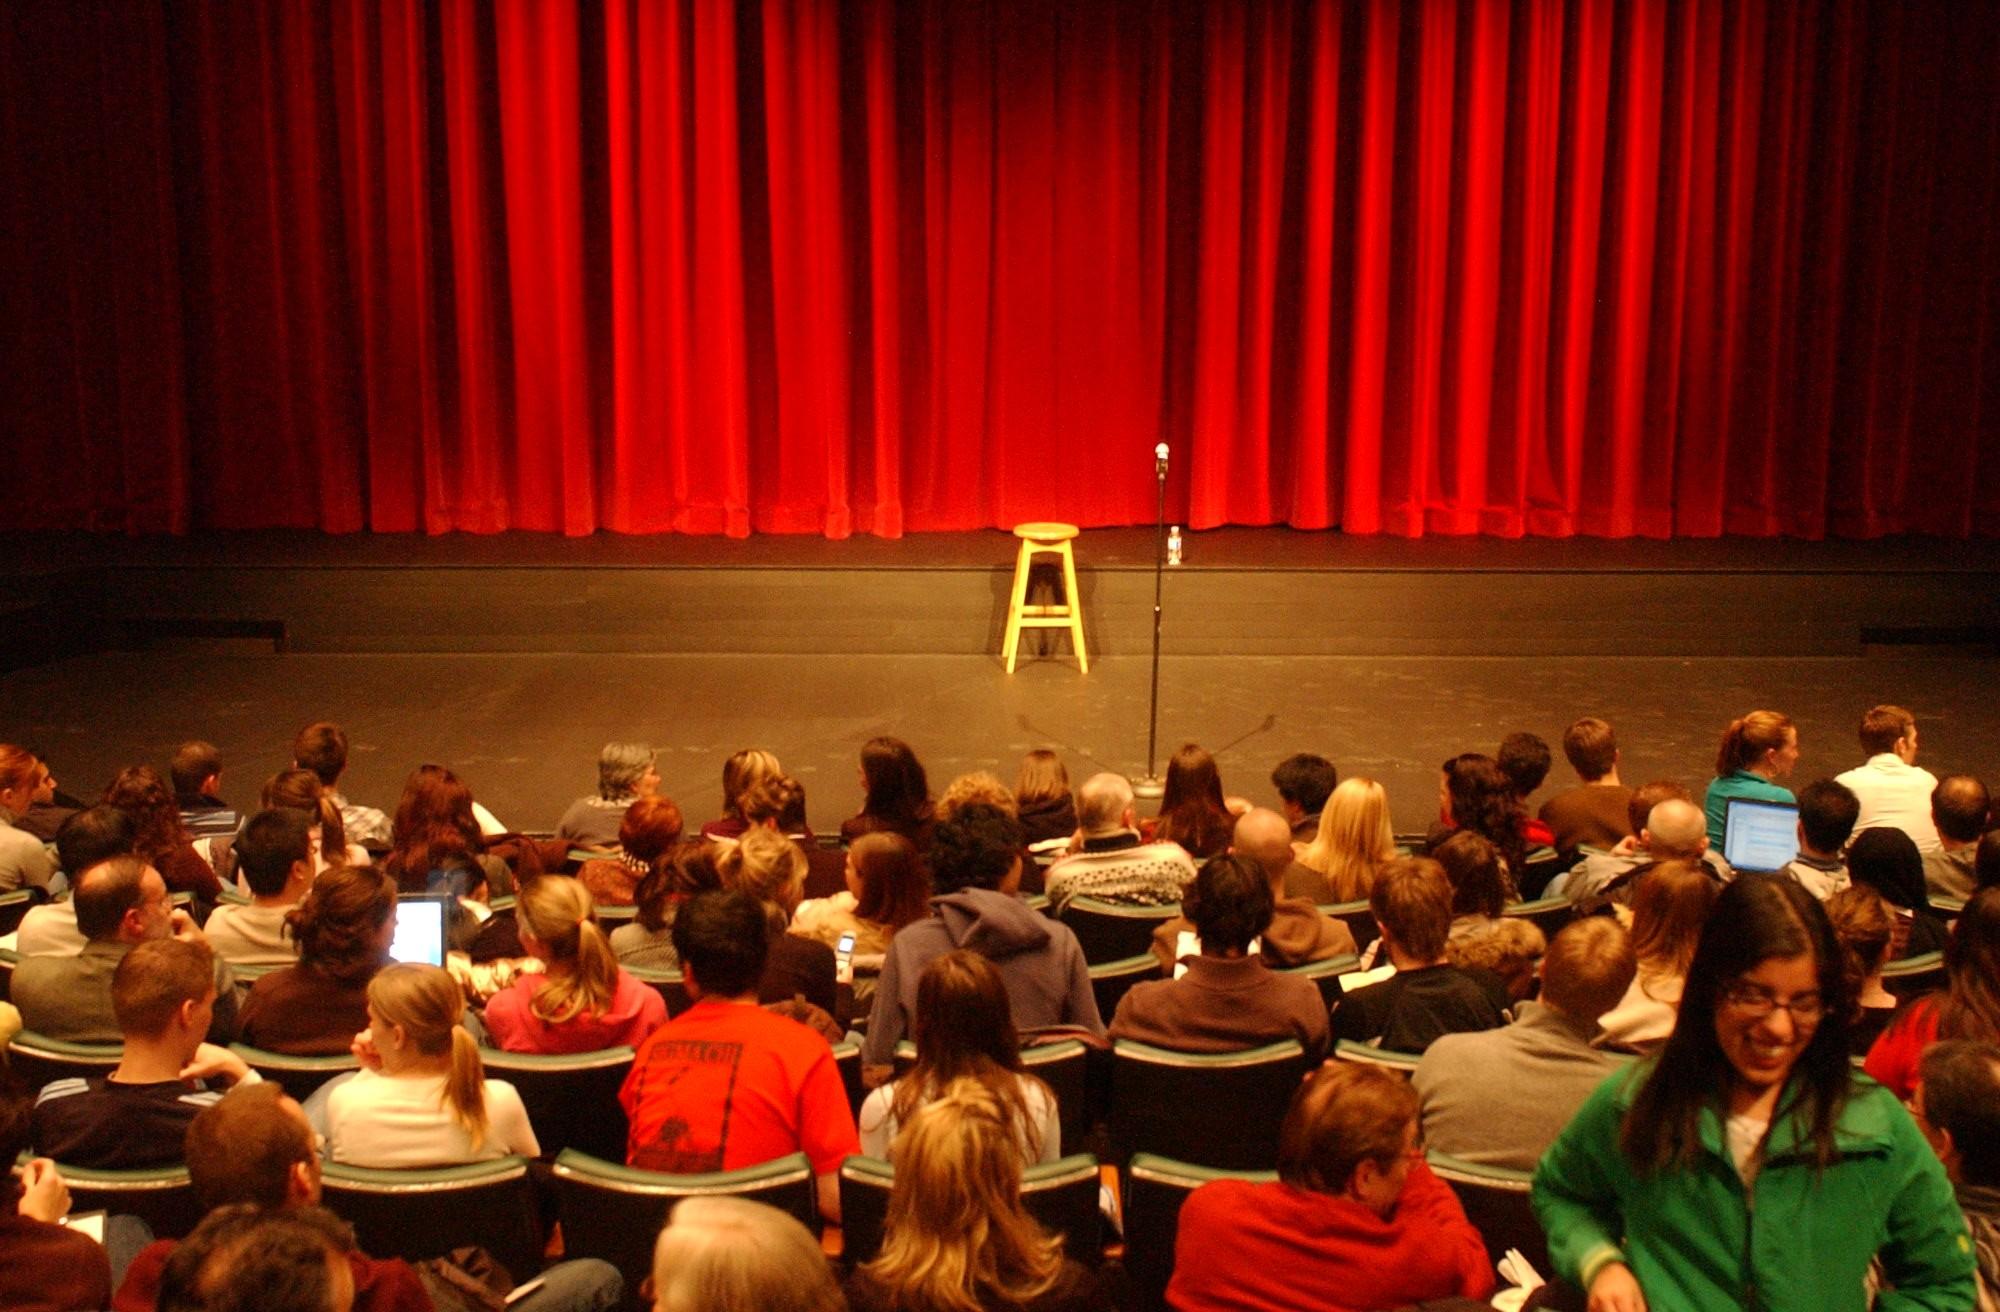 Audience with podium.jpg